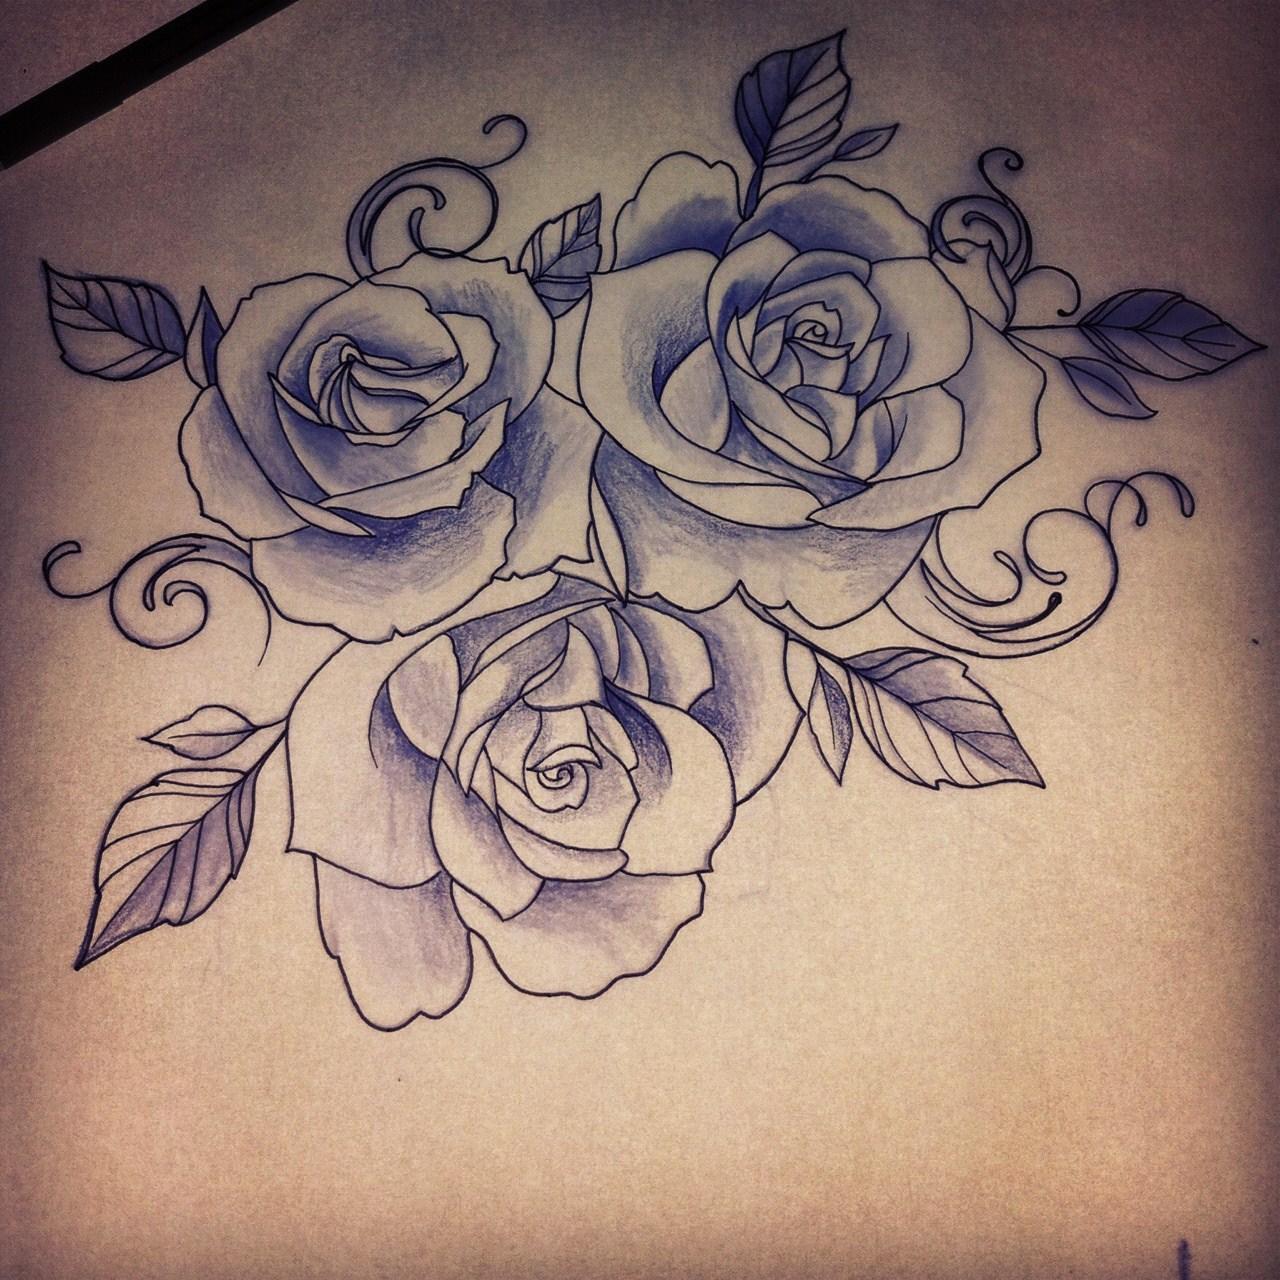 Drawn rose girly skull Sugar muertos dia  drawing